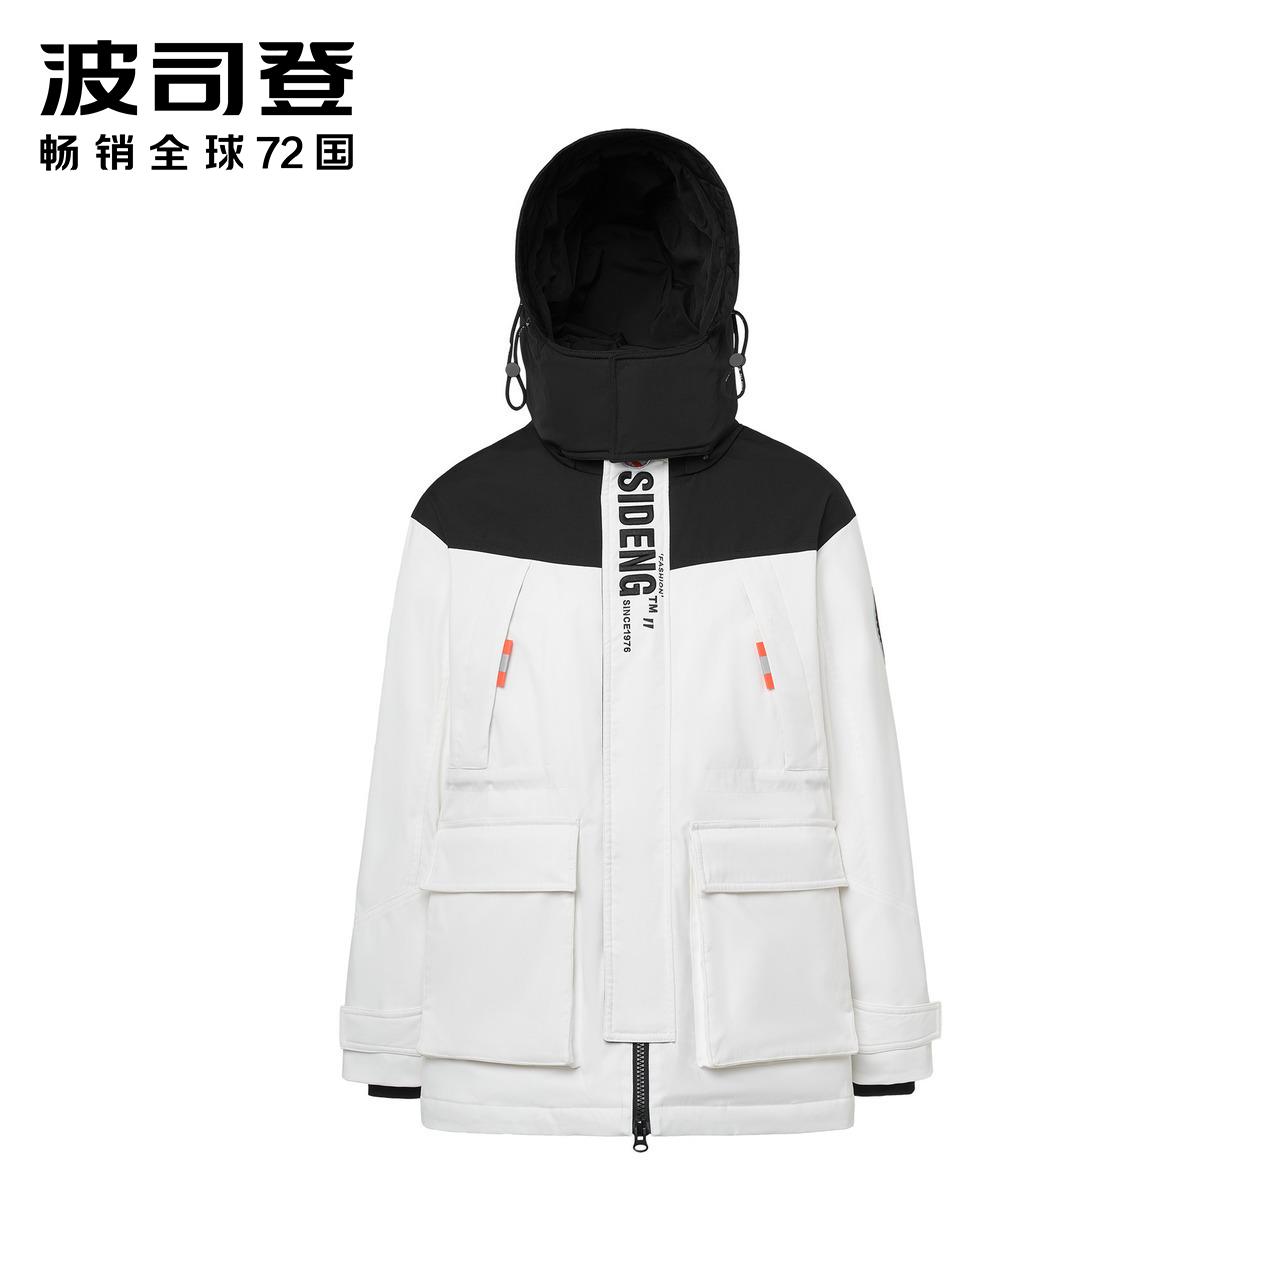 B90142535DS 羽绒服中长款新款 2019 波司登男 号发货 18 月 11 预售